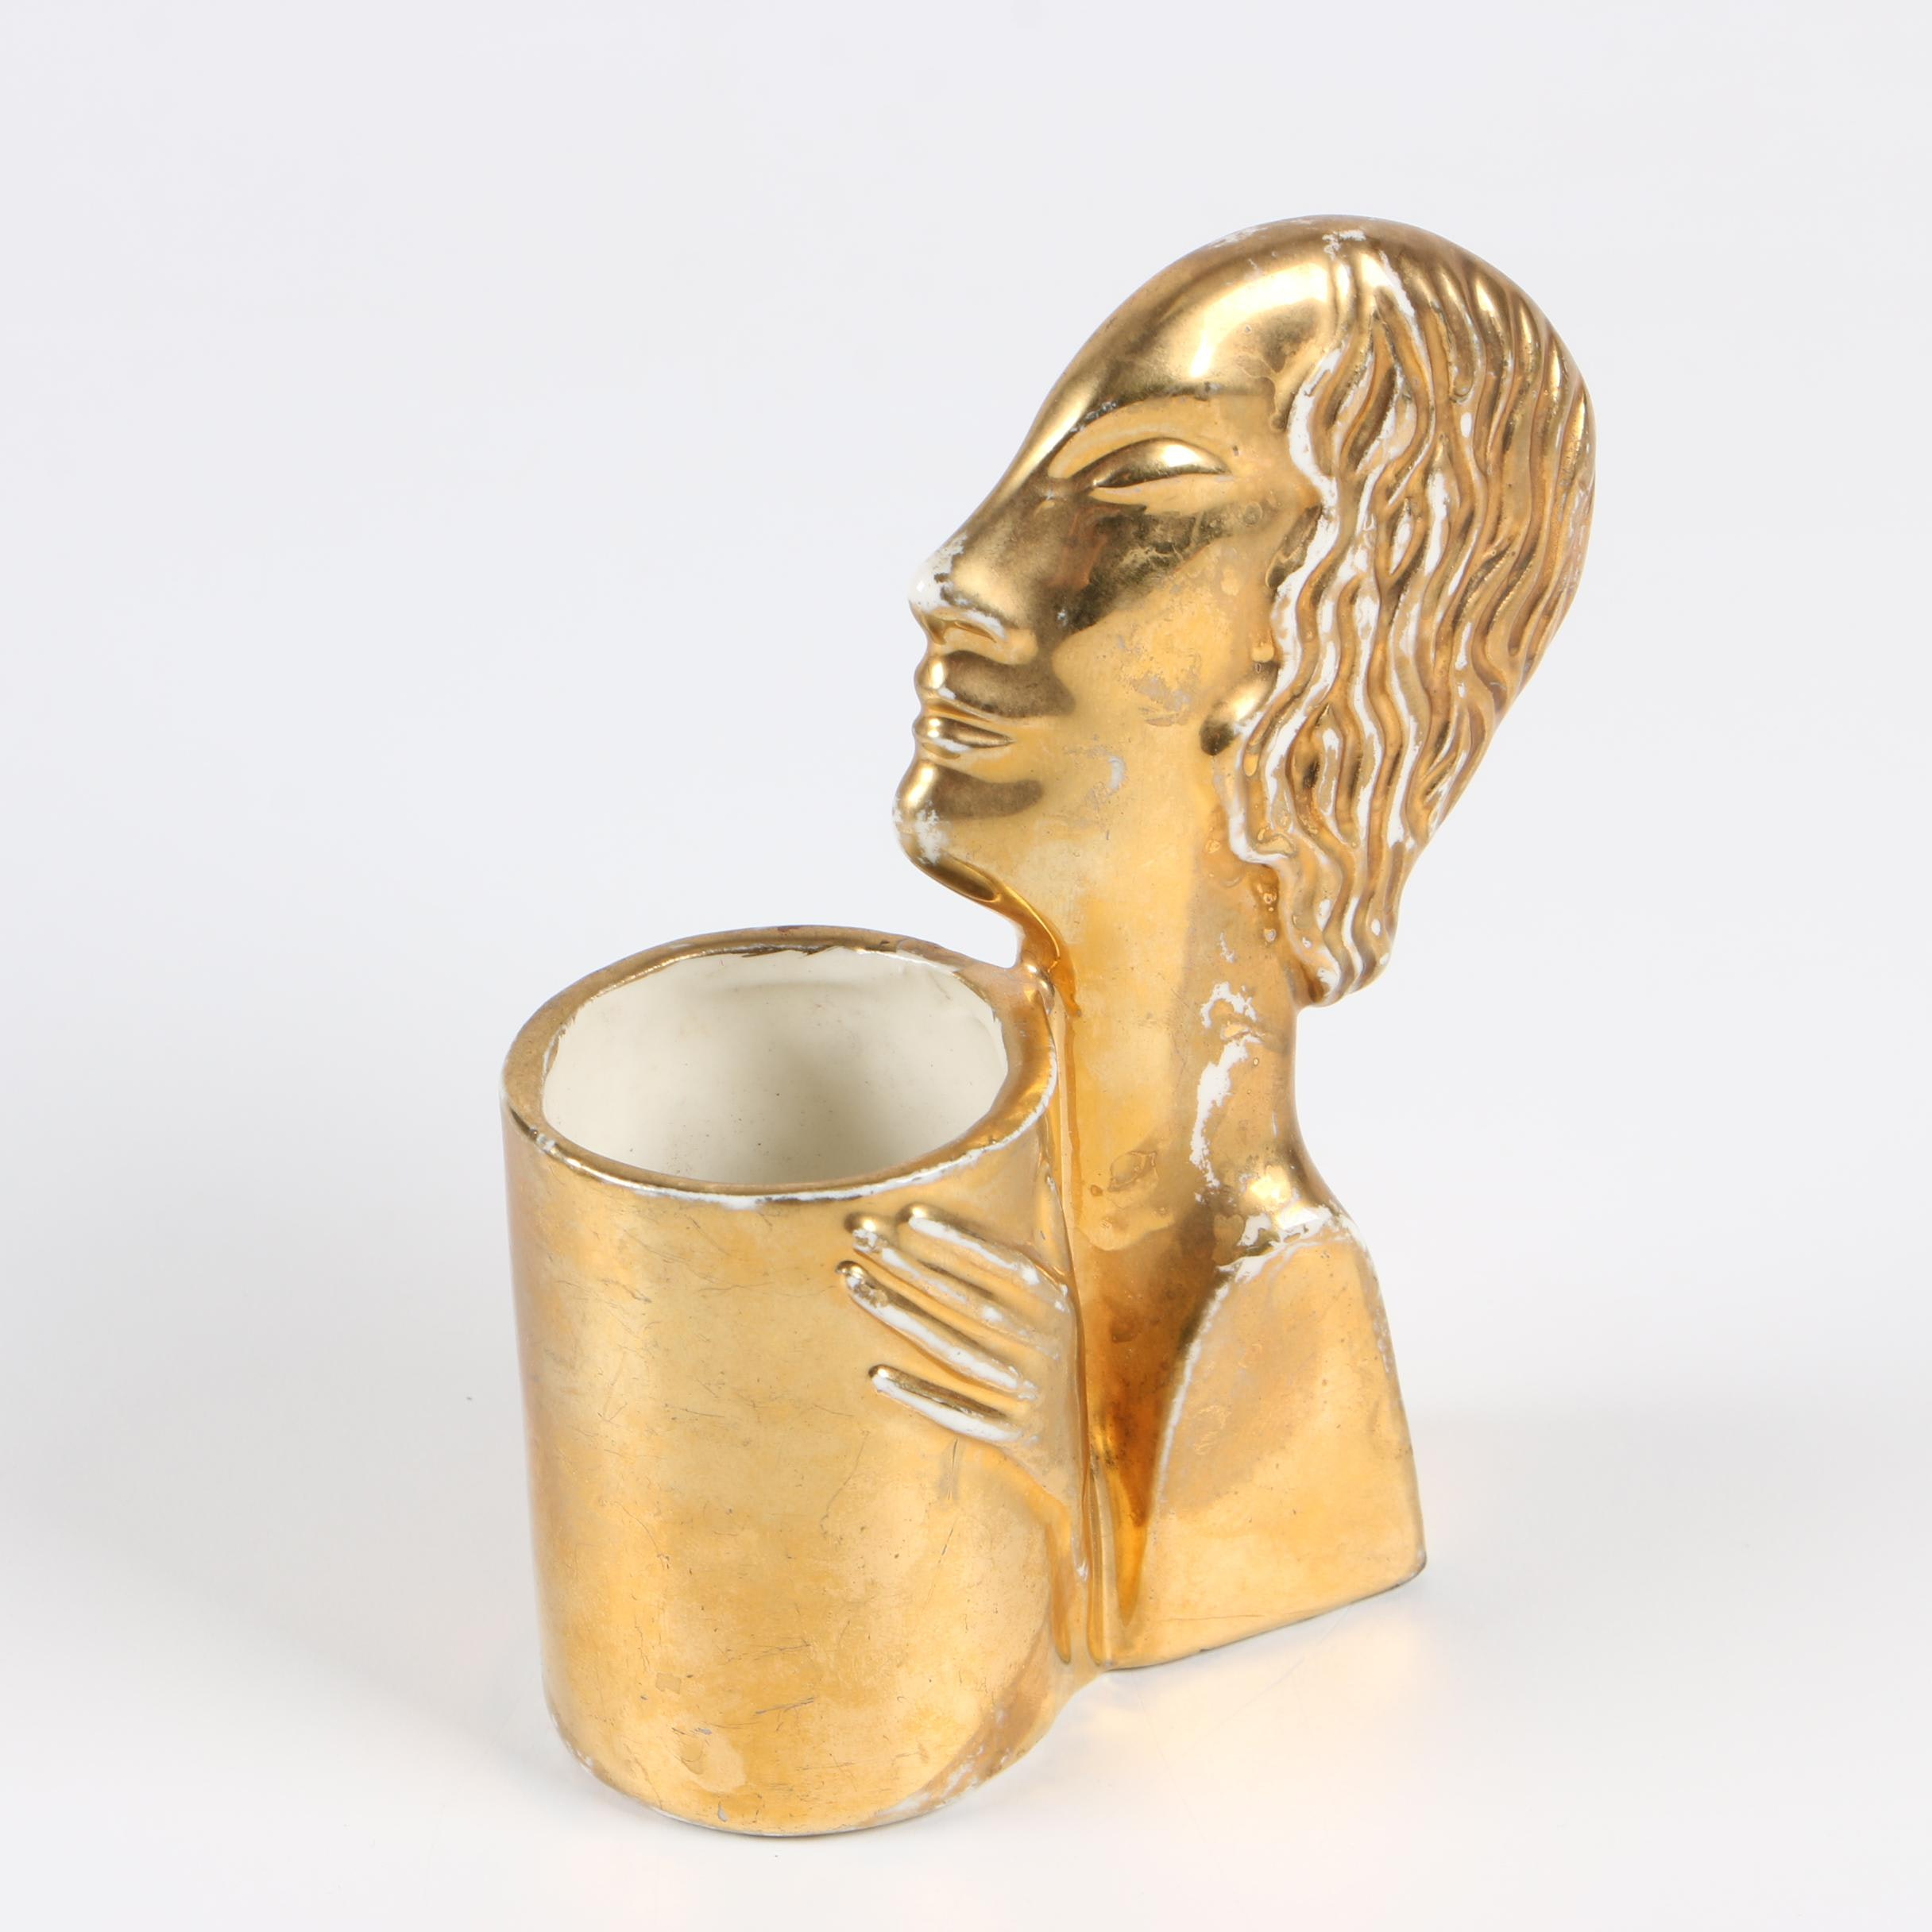 Czechoslovakian Art Deco Ceramic Gold Lustre Glazed Vase, Early 20th Century